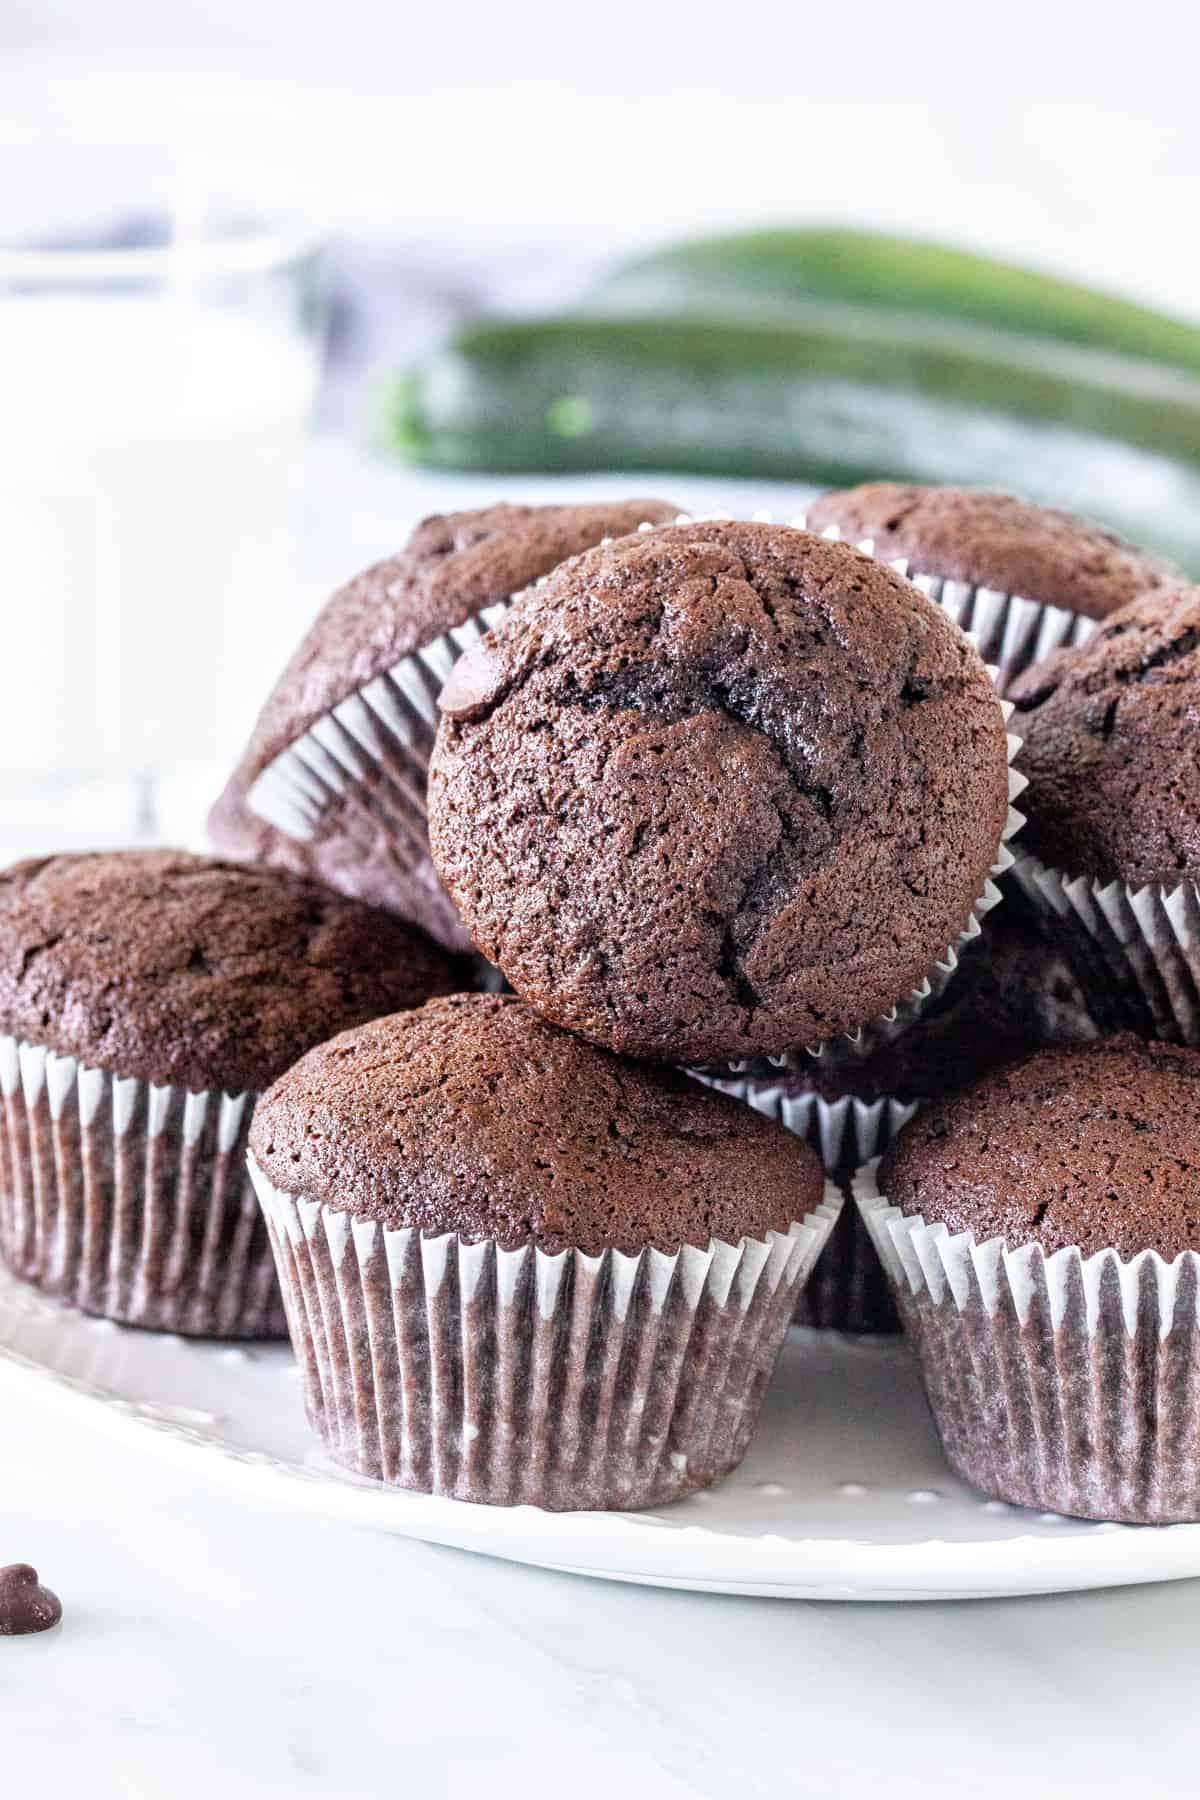 Plate of chocolate zucchini muffins